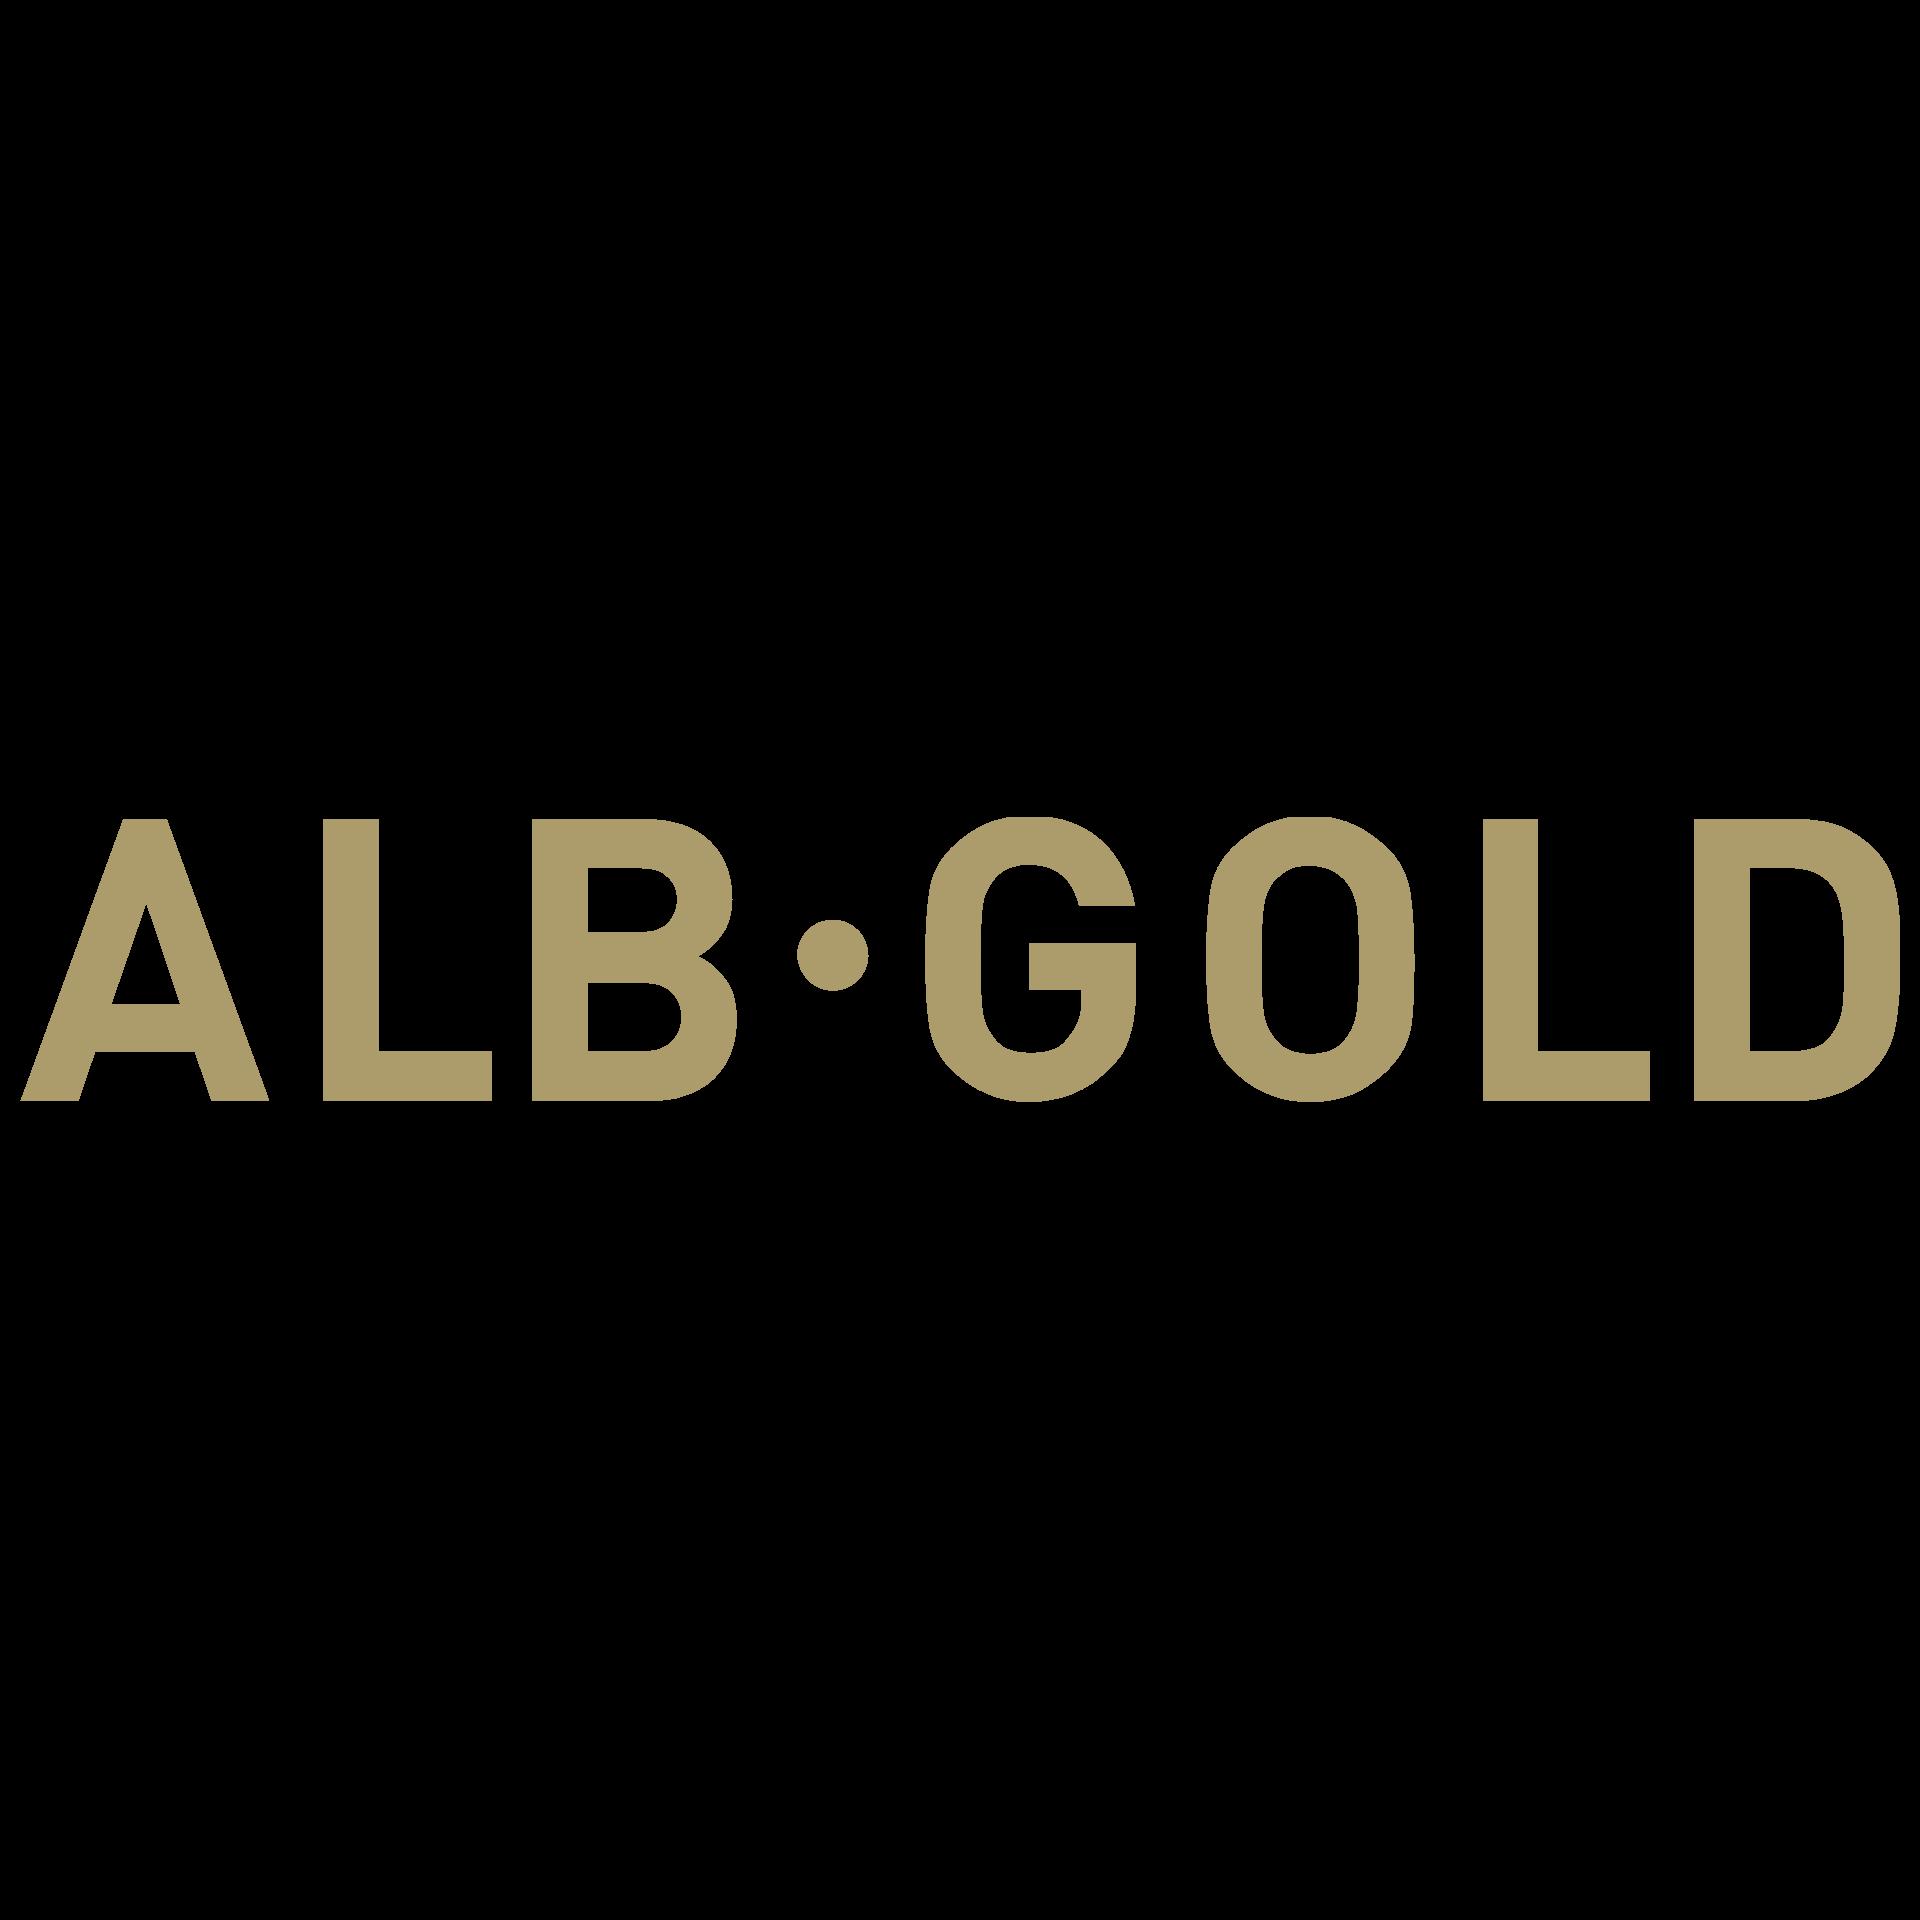 ALB.GOLD